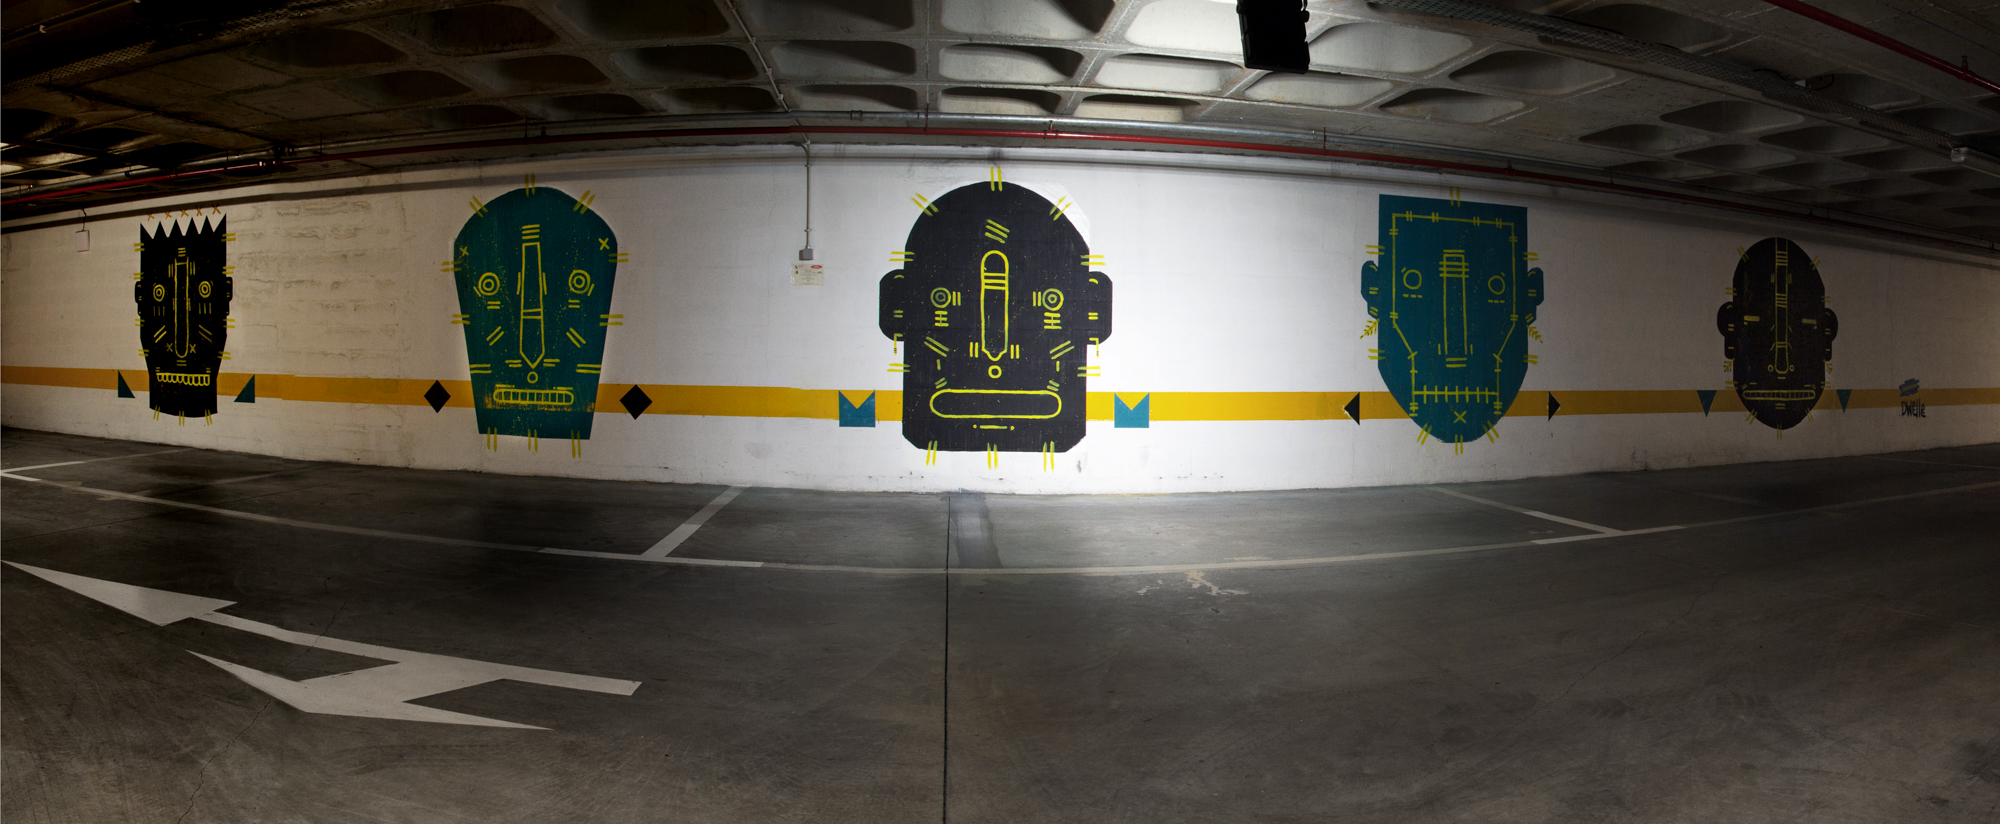 artparking_27